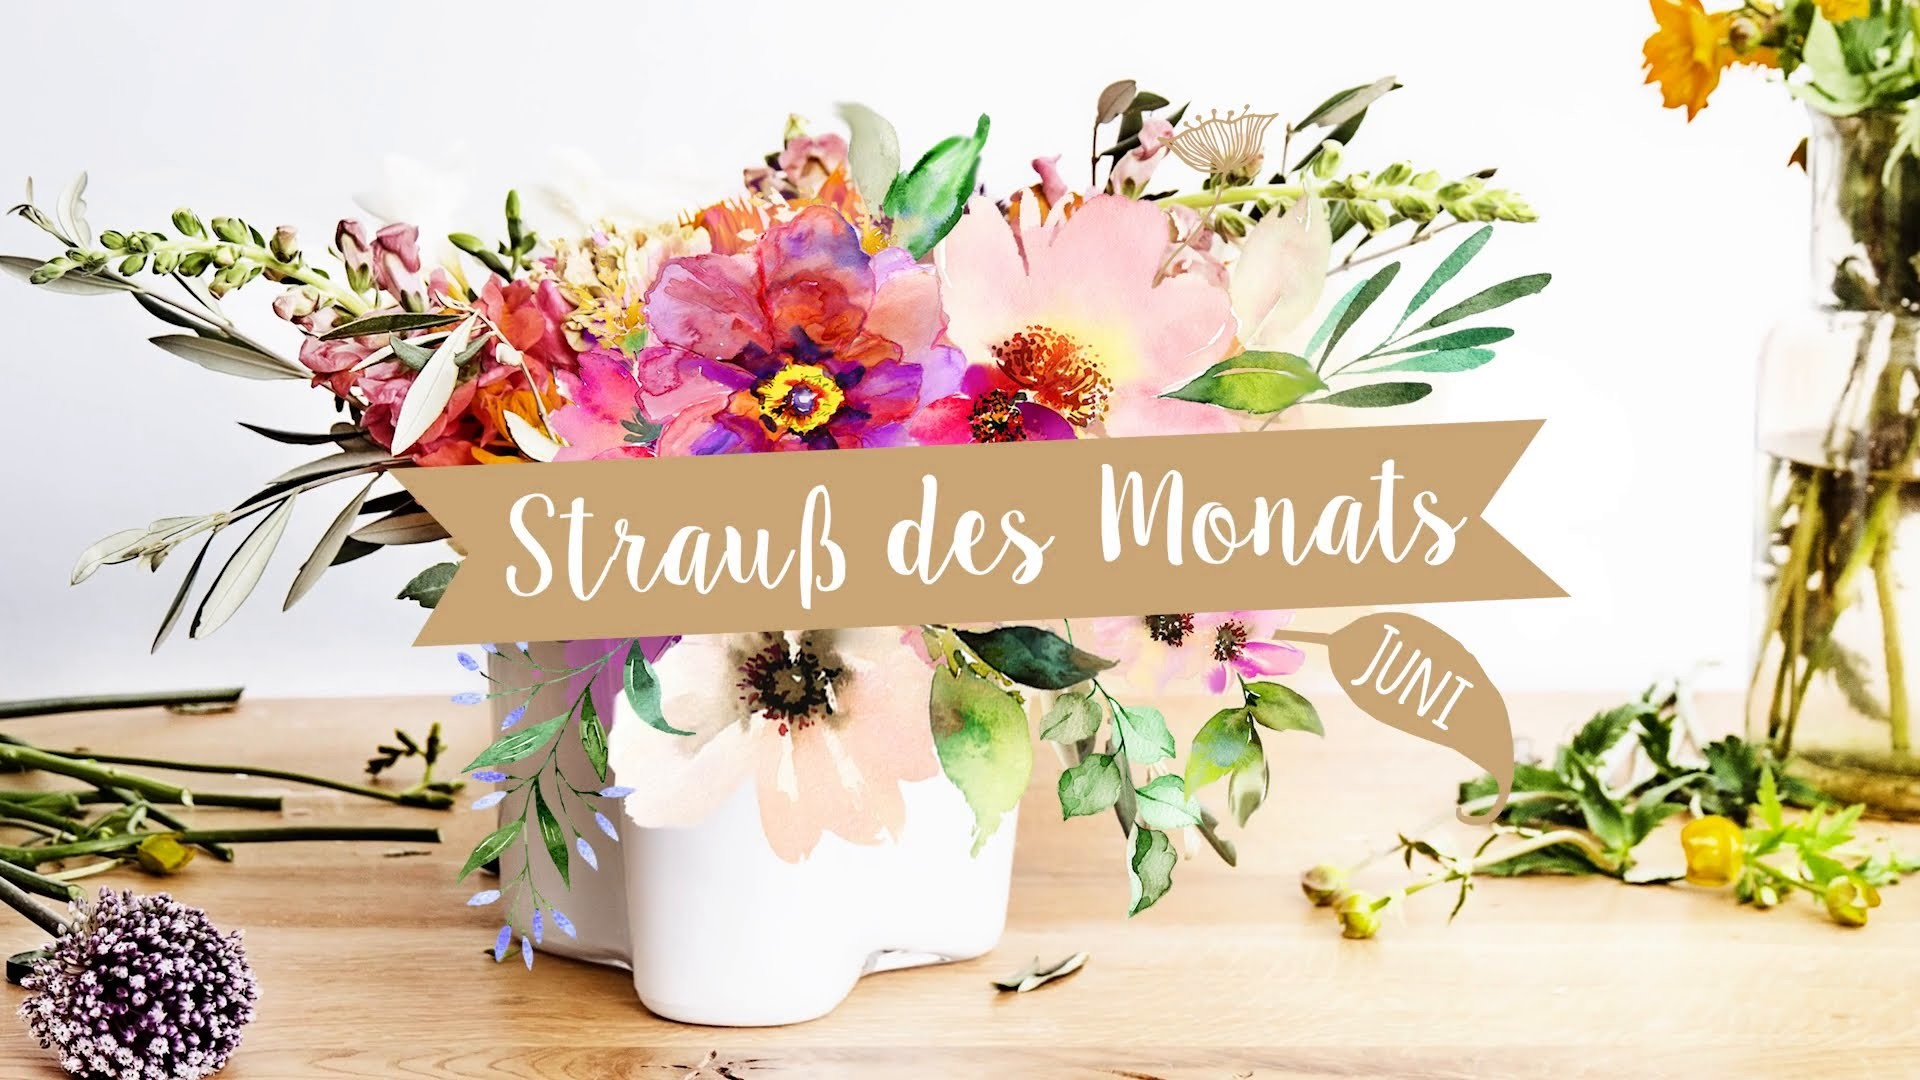 Boho Blüten - Strauß des Monats Juni | WESTWING DIY Tipps